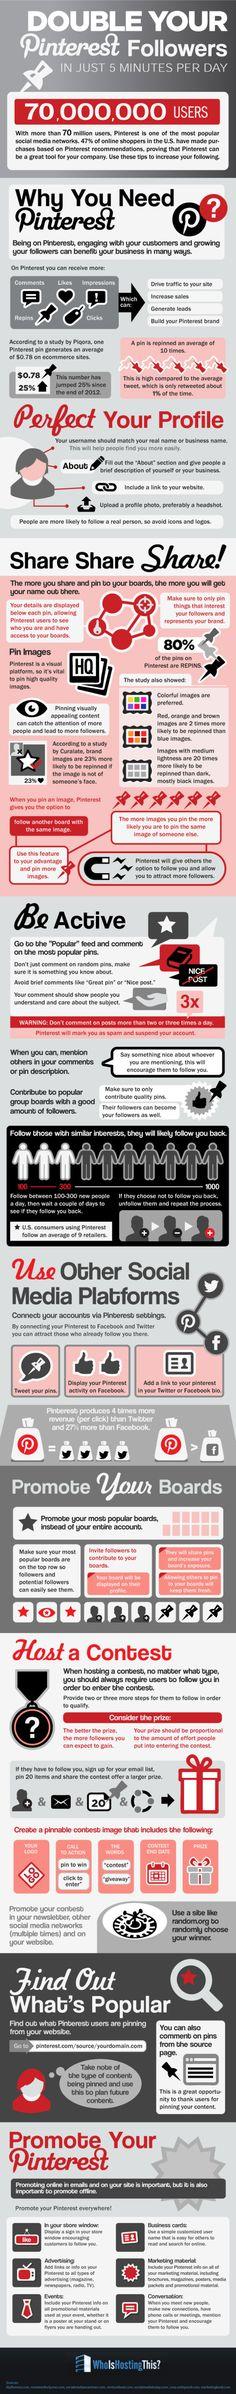 Double your Pinterest followers #infografia #infographic #socialmedia